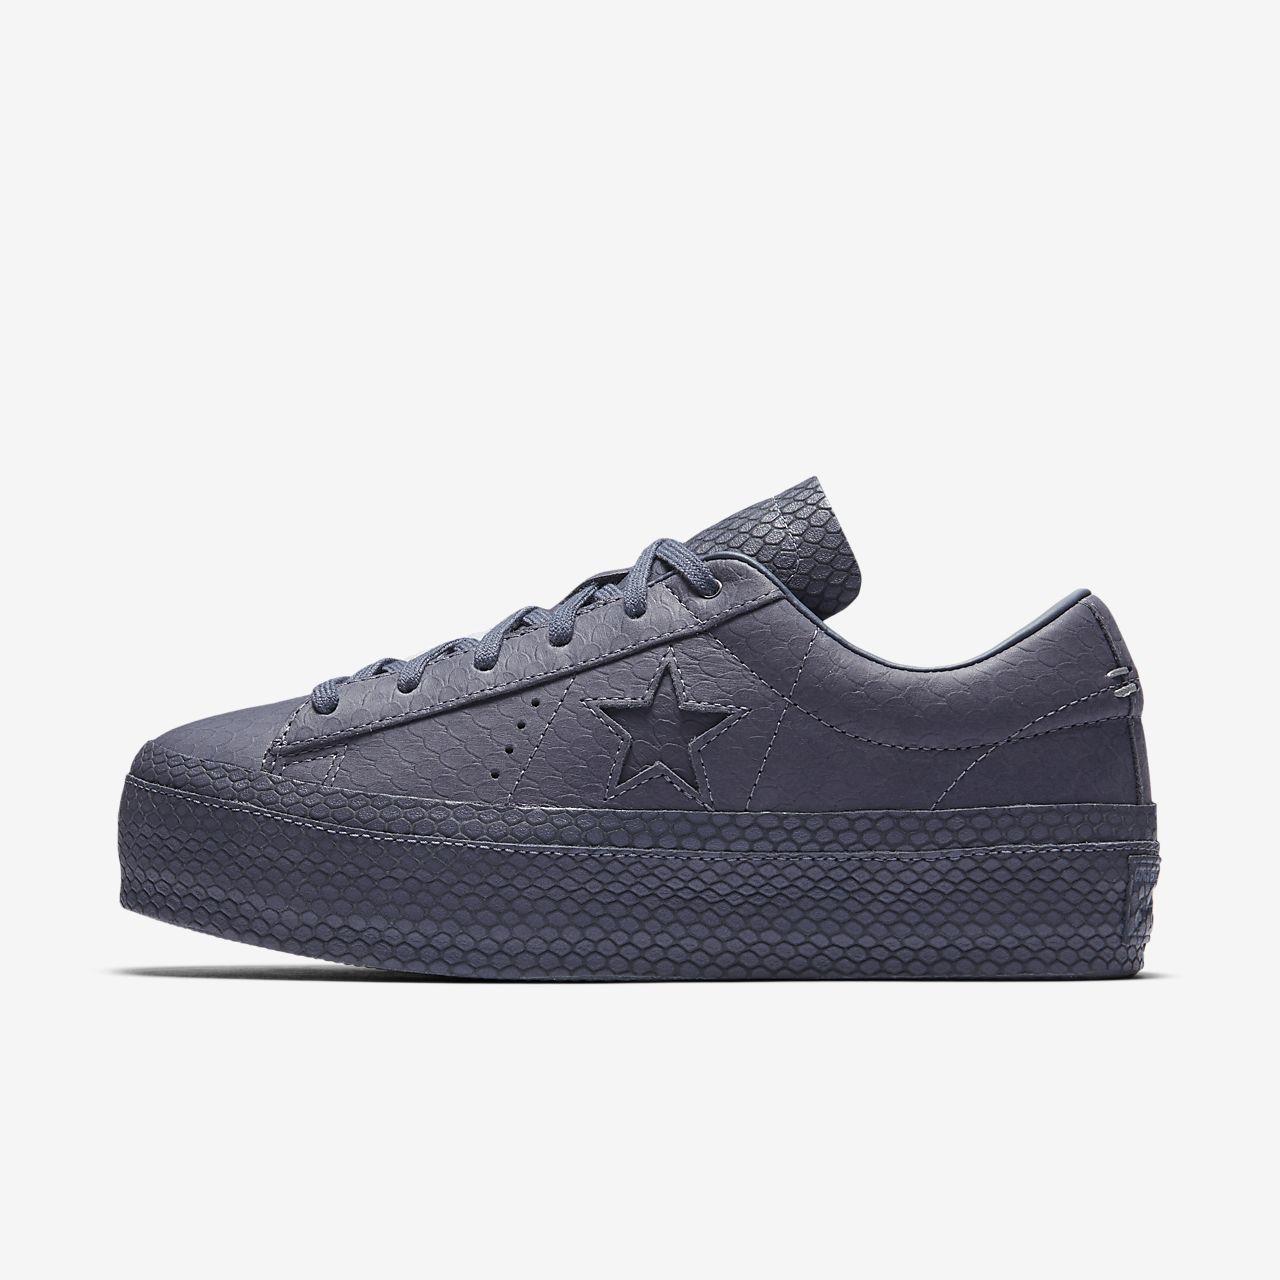 Converse One Star Platform Premium Leather Low Top Women's Shoe